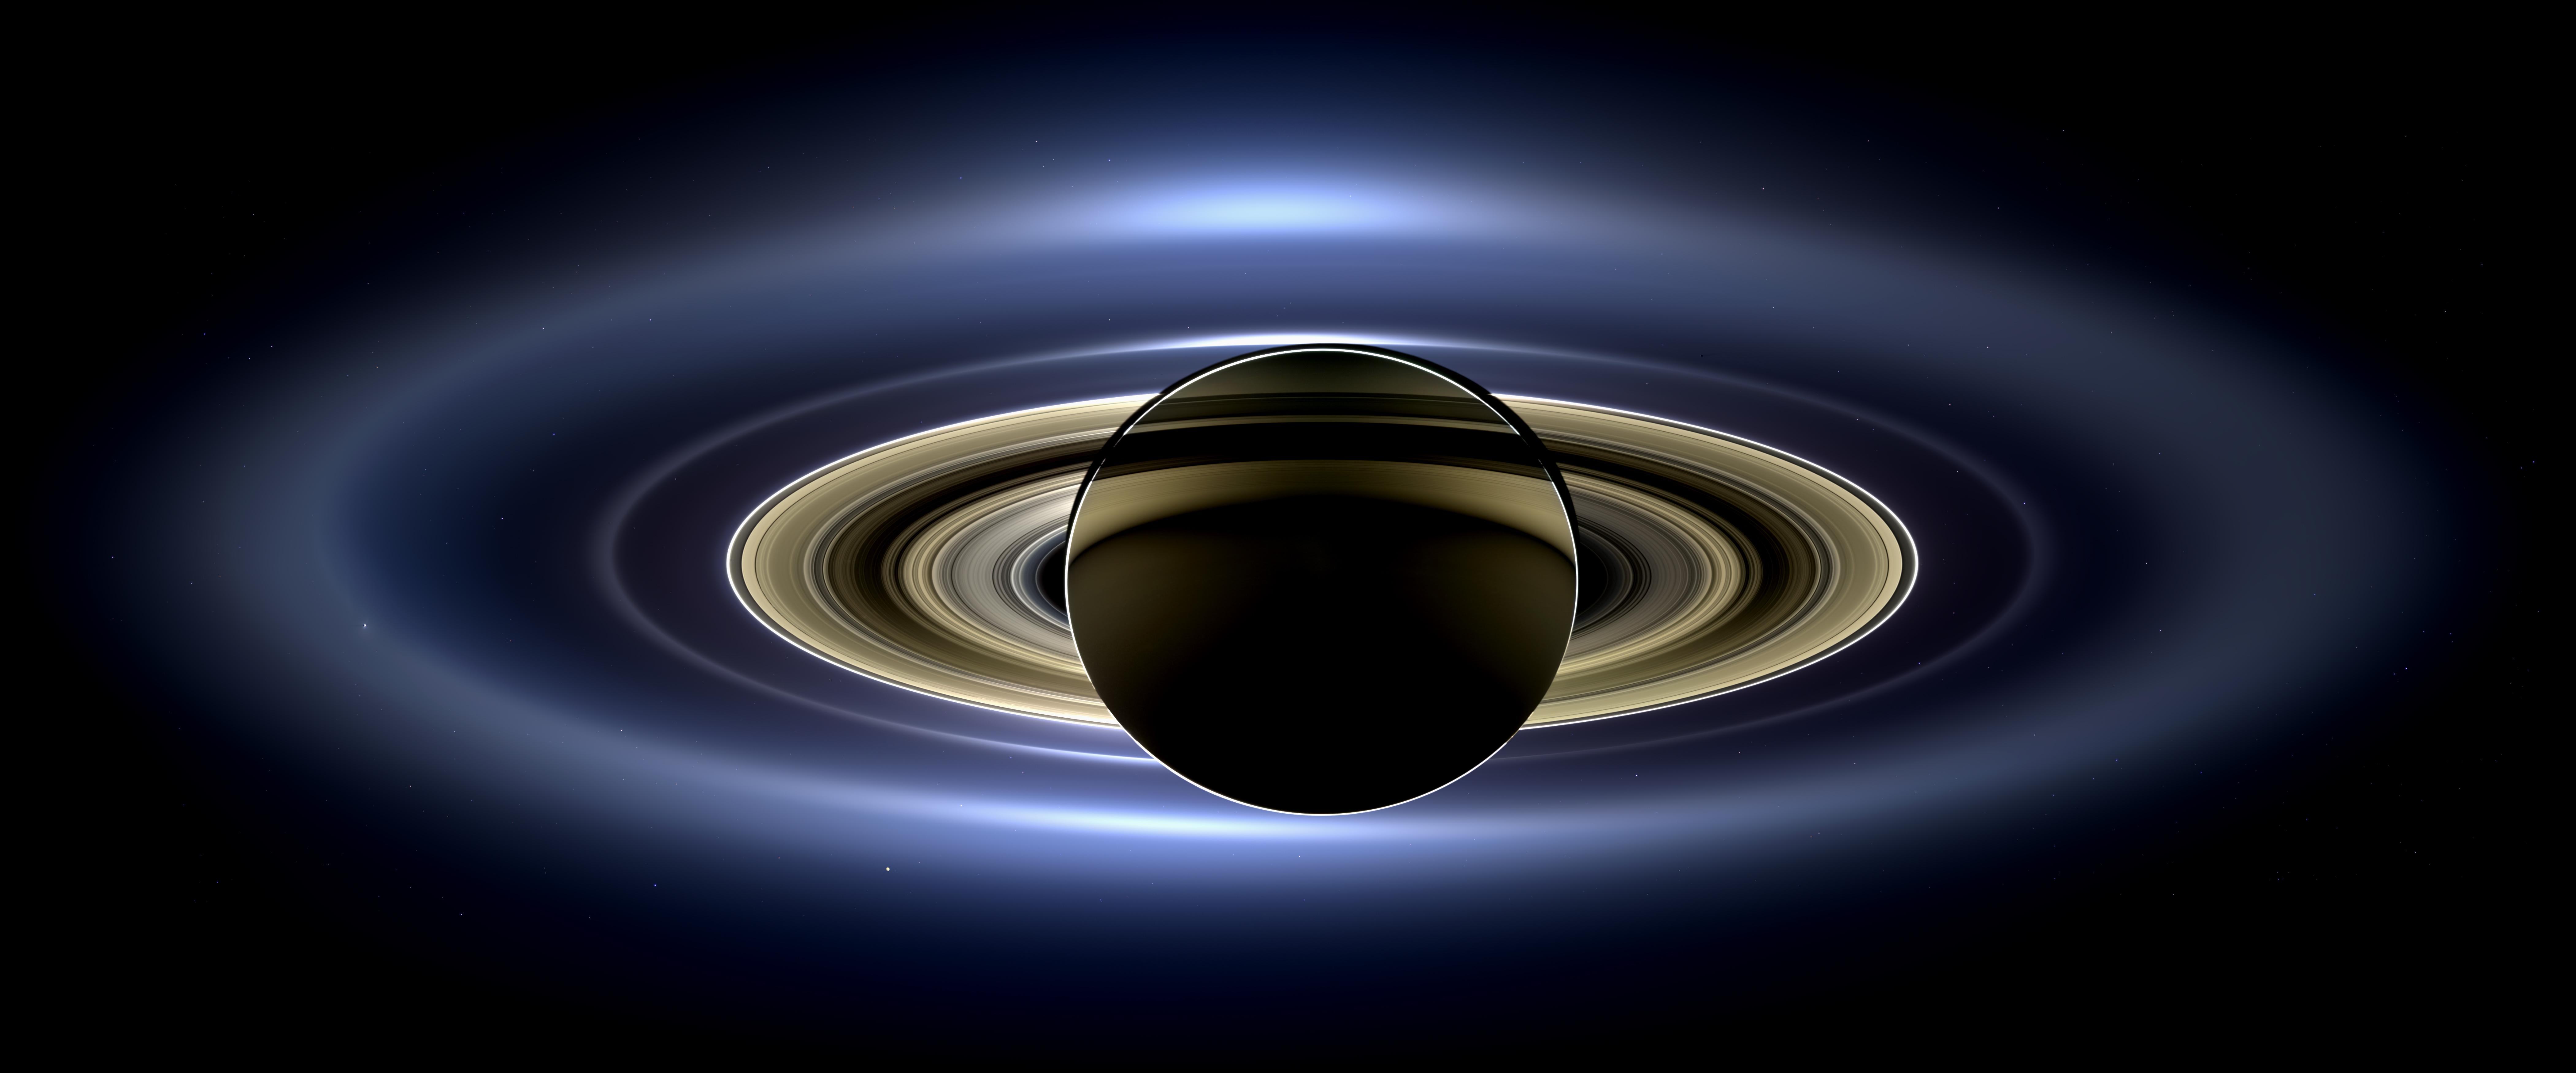 Saturnus ontmaskerd